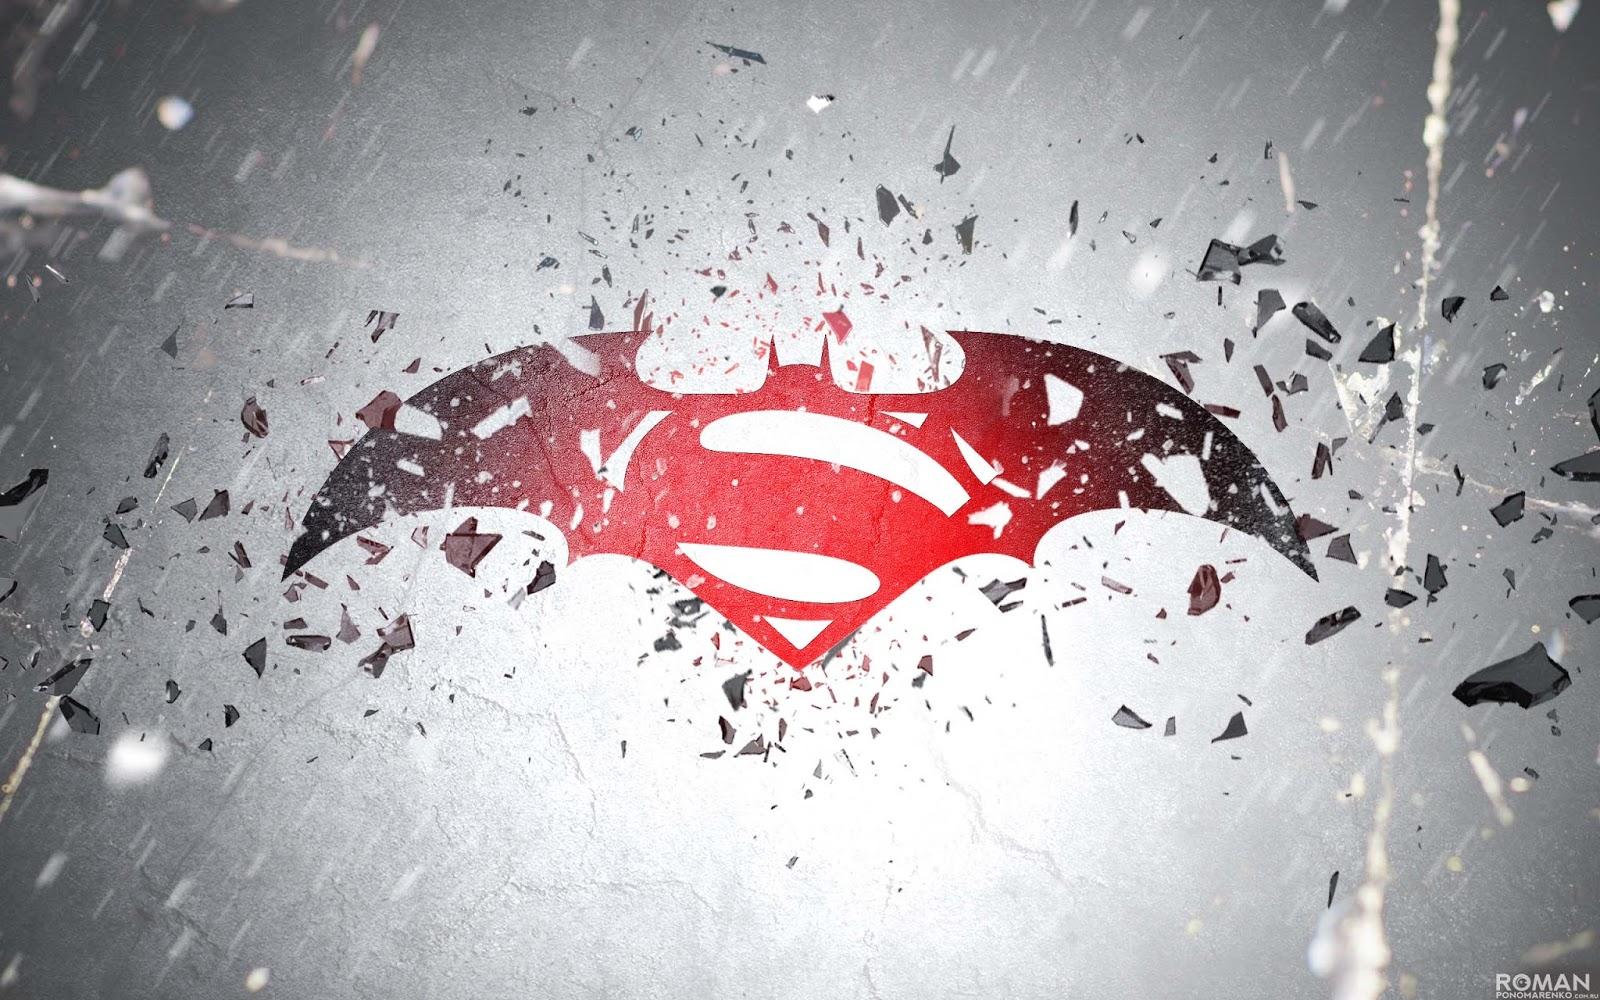 Batman Vs. Superman: Baixe Aqui Os Melhores Papéis De